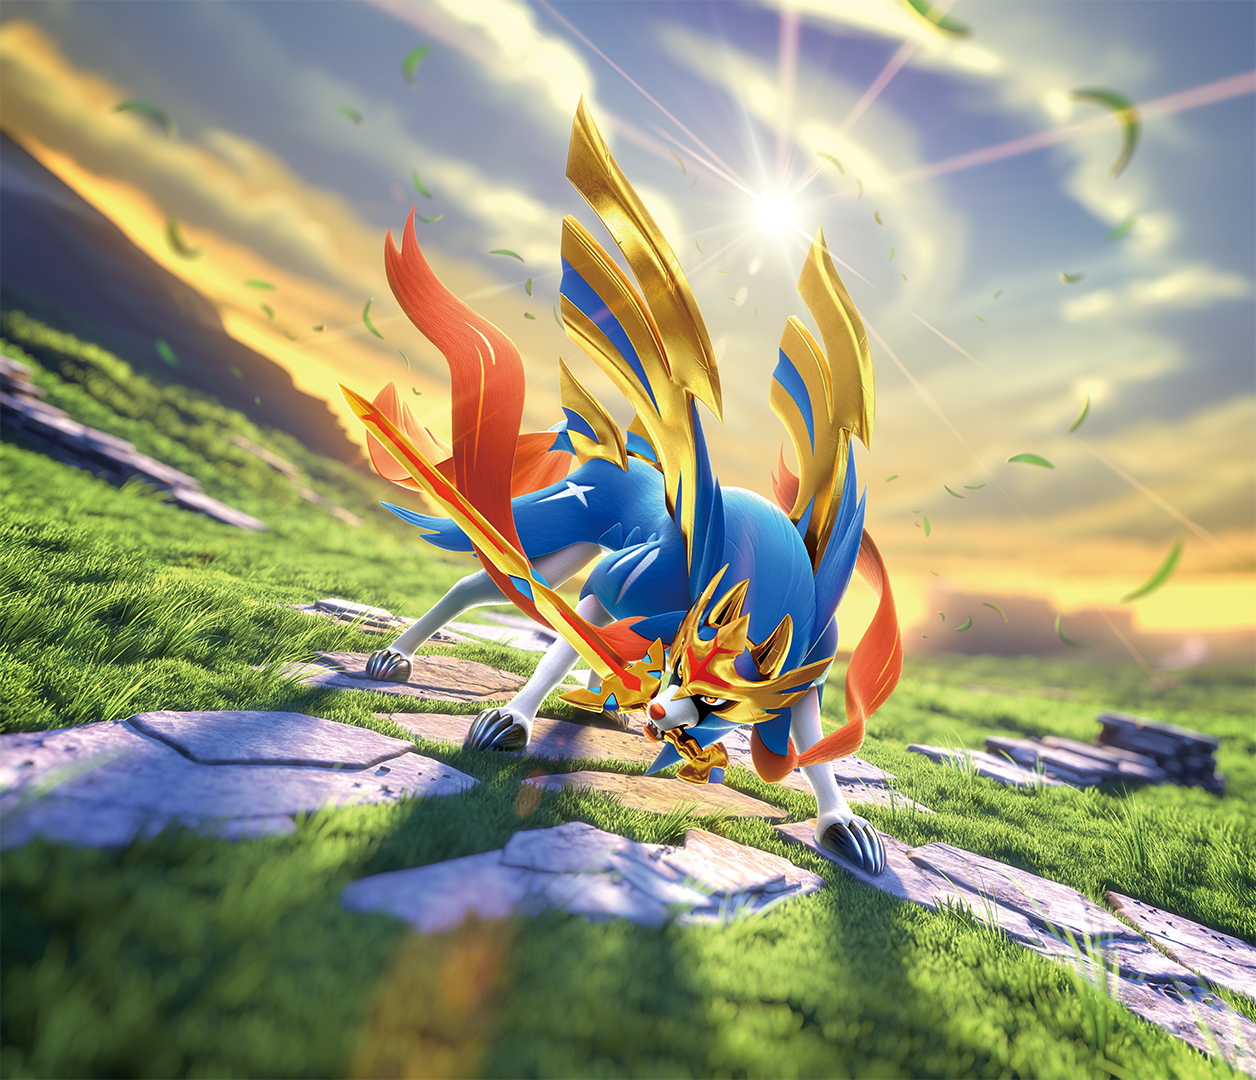 Zacian And Zamazenta Pokemon Sword And Shield 4k 3840x2160 Wallpaper Pokemon Backgrounds Cute Pokemon Wallpaper Pokemon